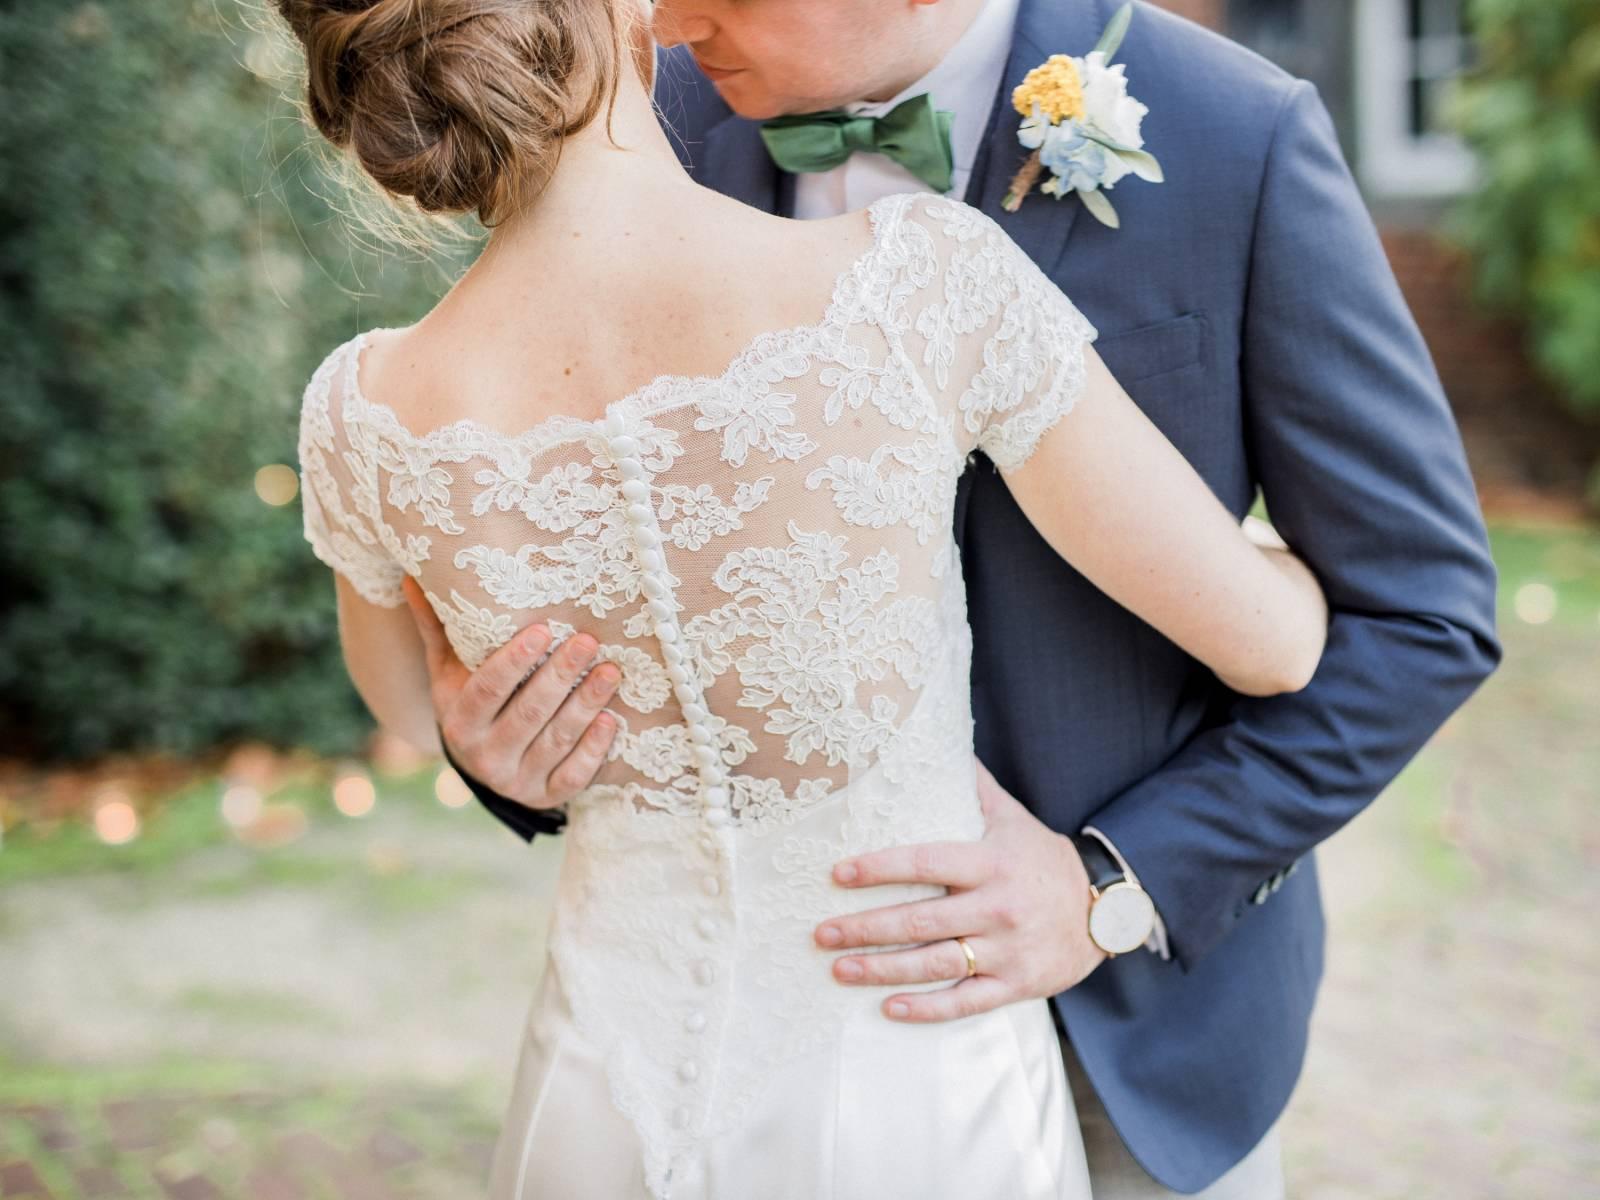 Elisabeth Van Lent Fine Art Wedding Photography - Ferme de Balingue wedding-22